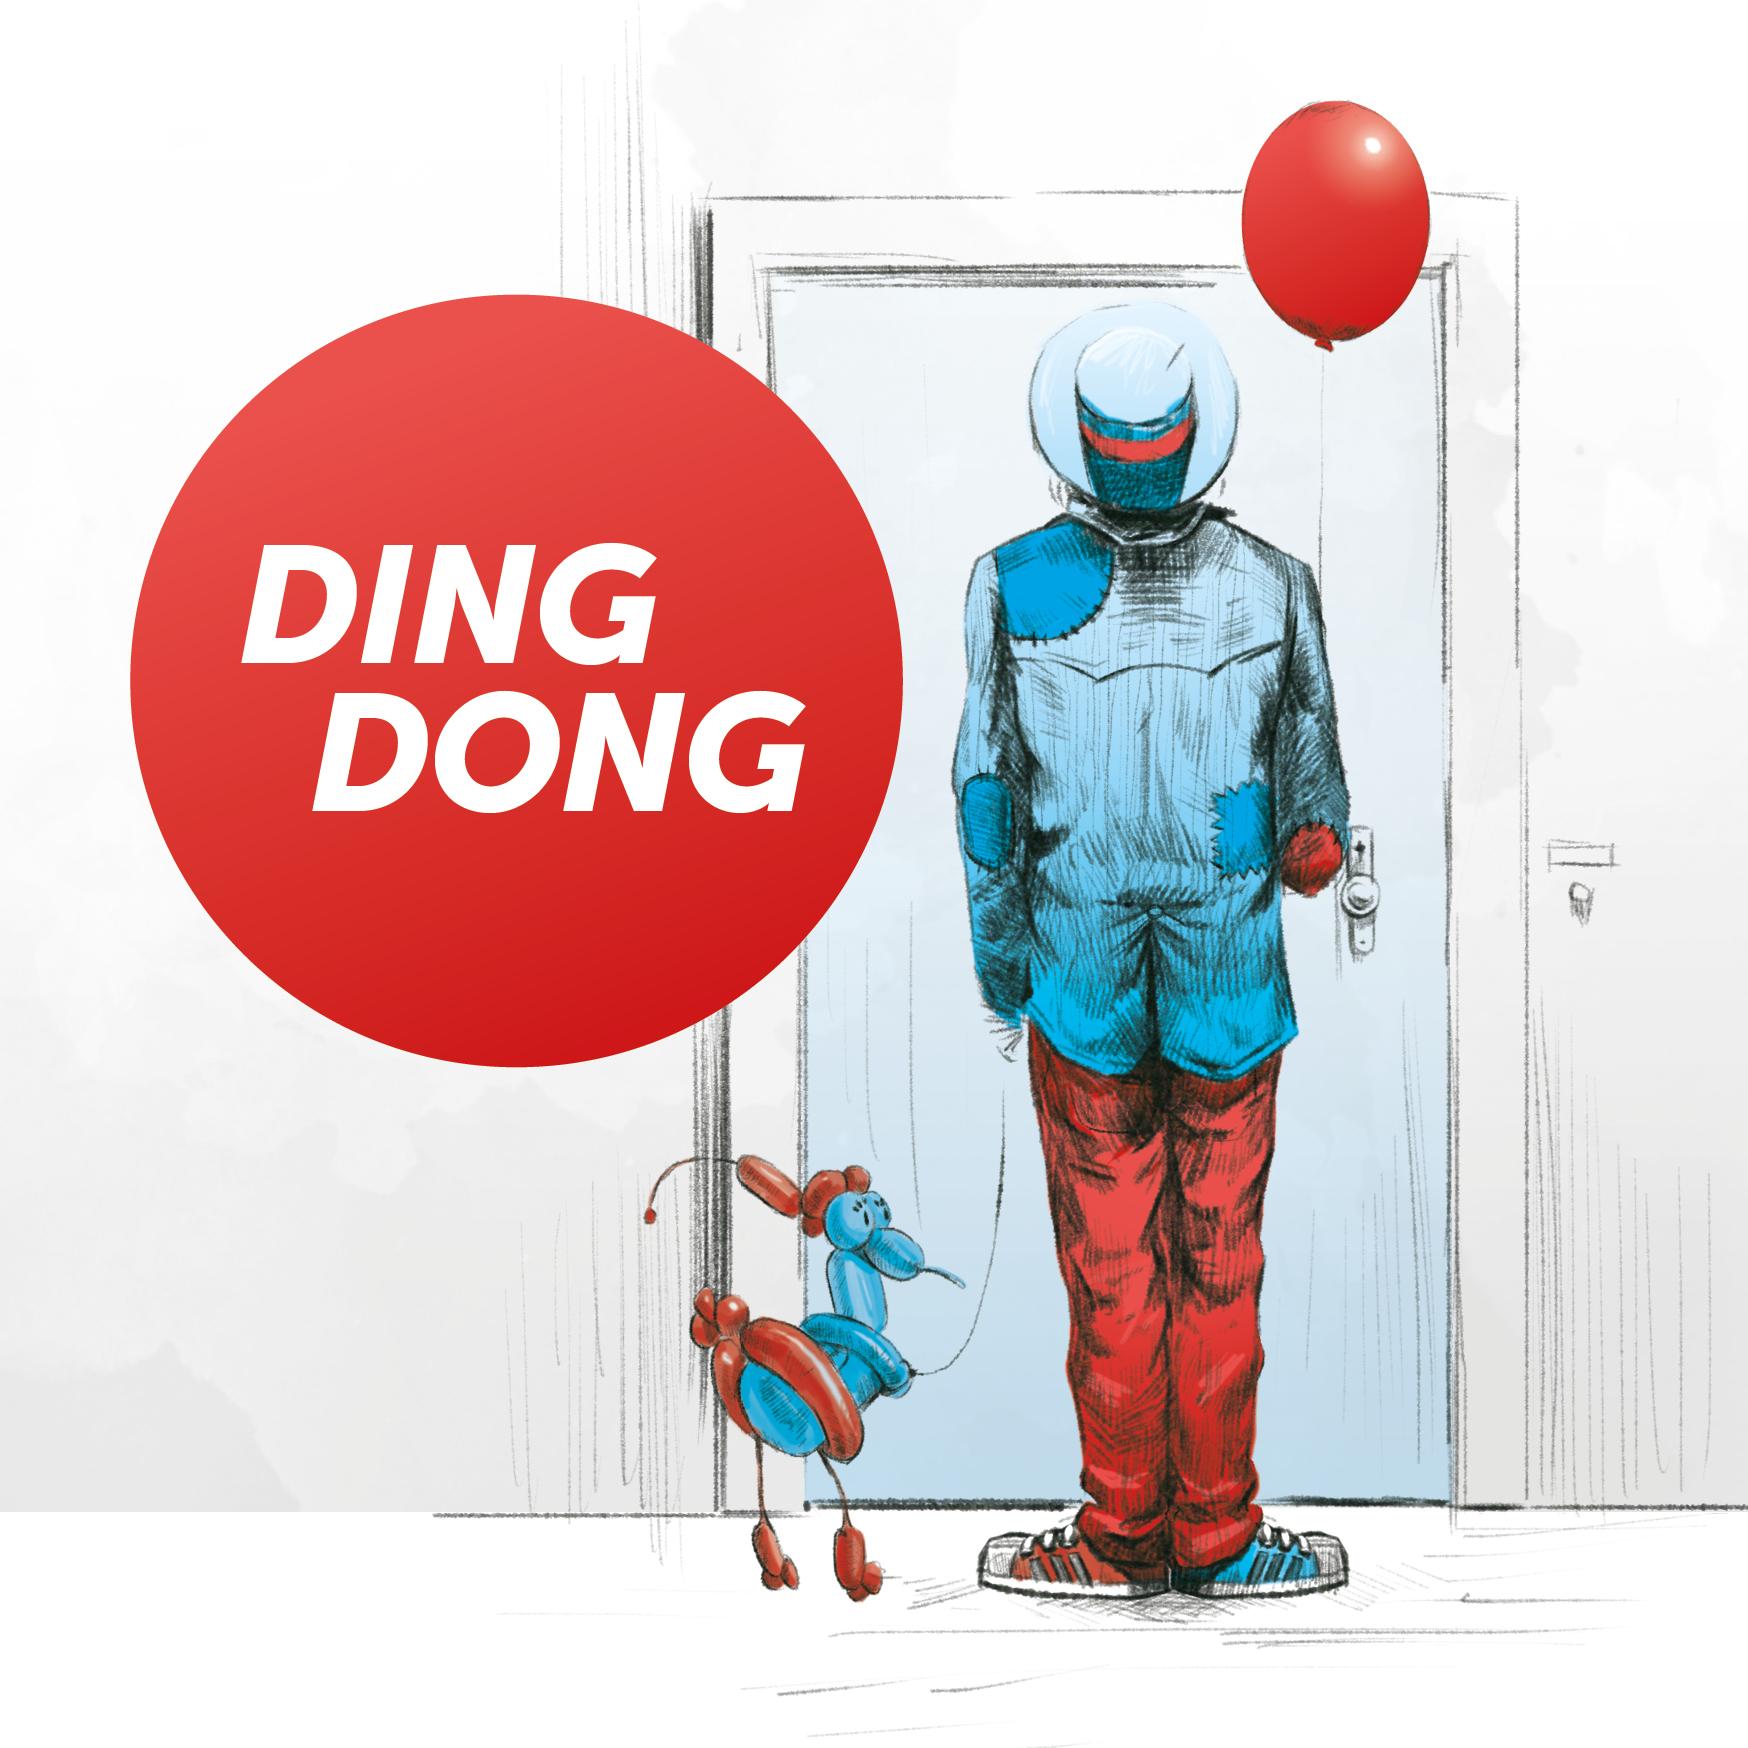 DingDong-1.jpg